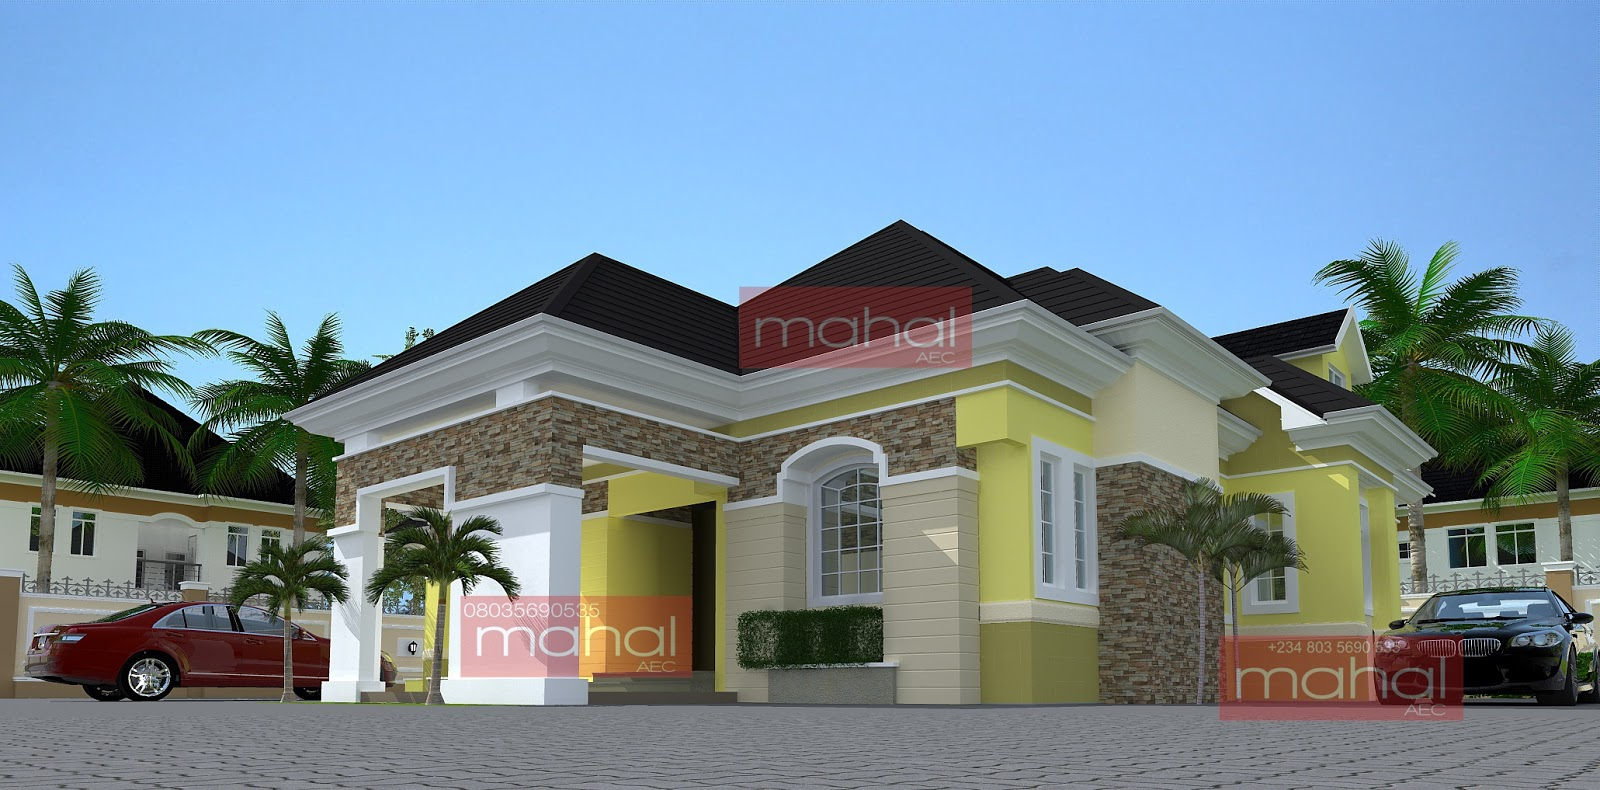 Parapet designs on bungalows in nigeria for Modern house designs in nigeria